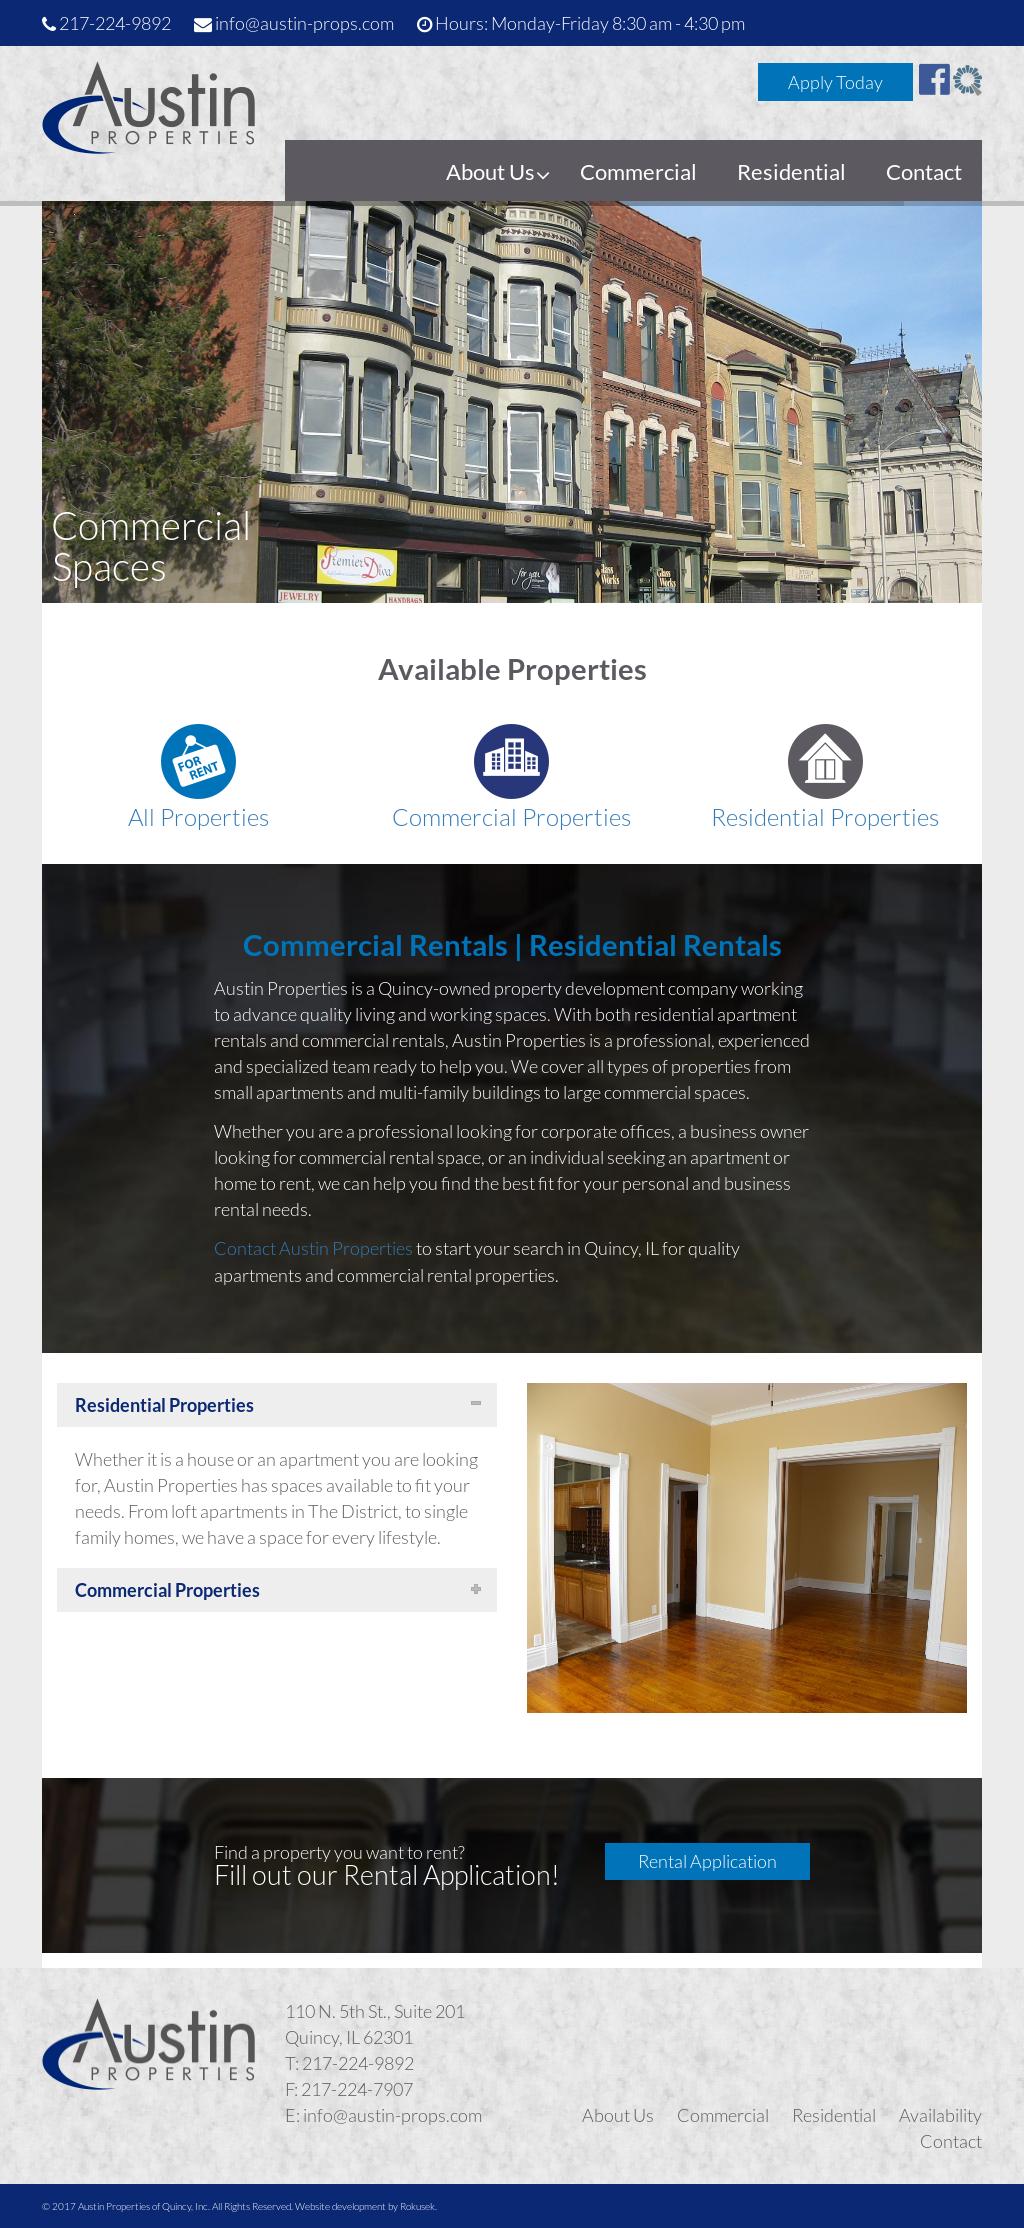 Austin Properties Management Website History